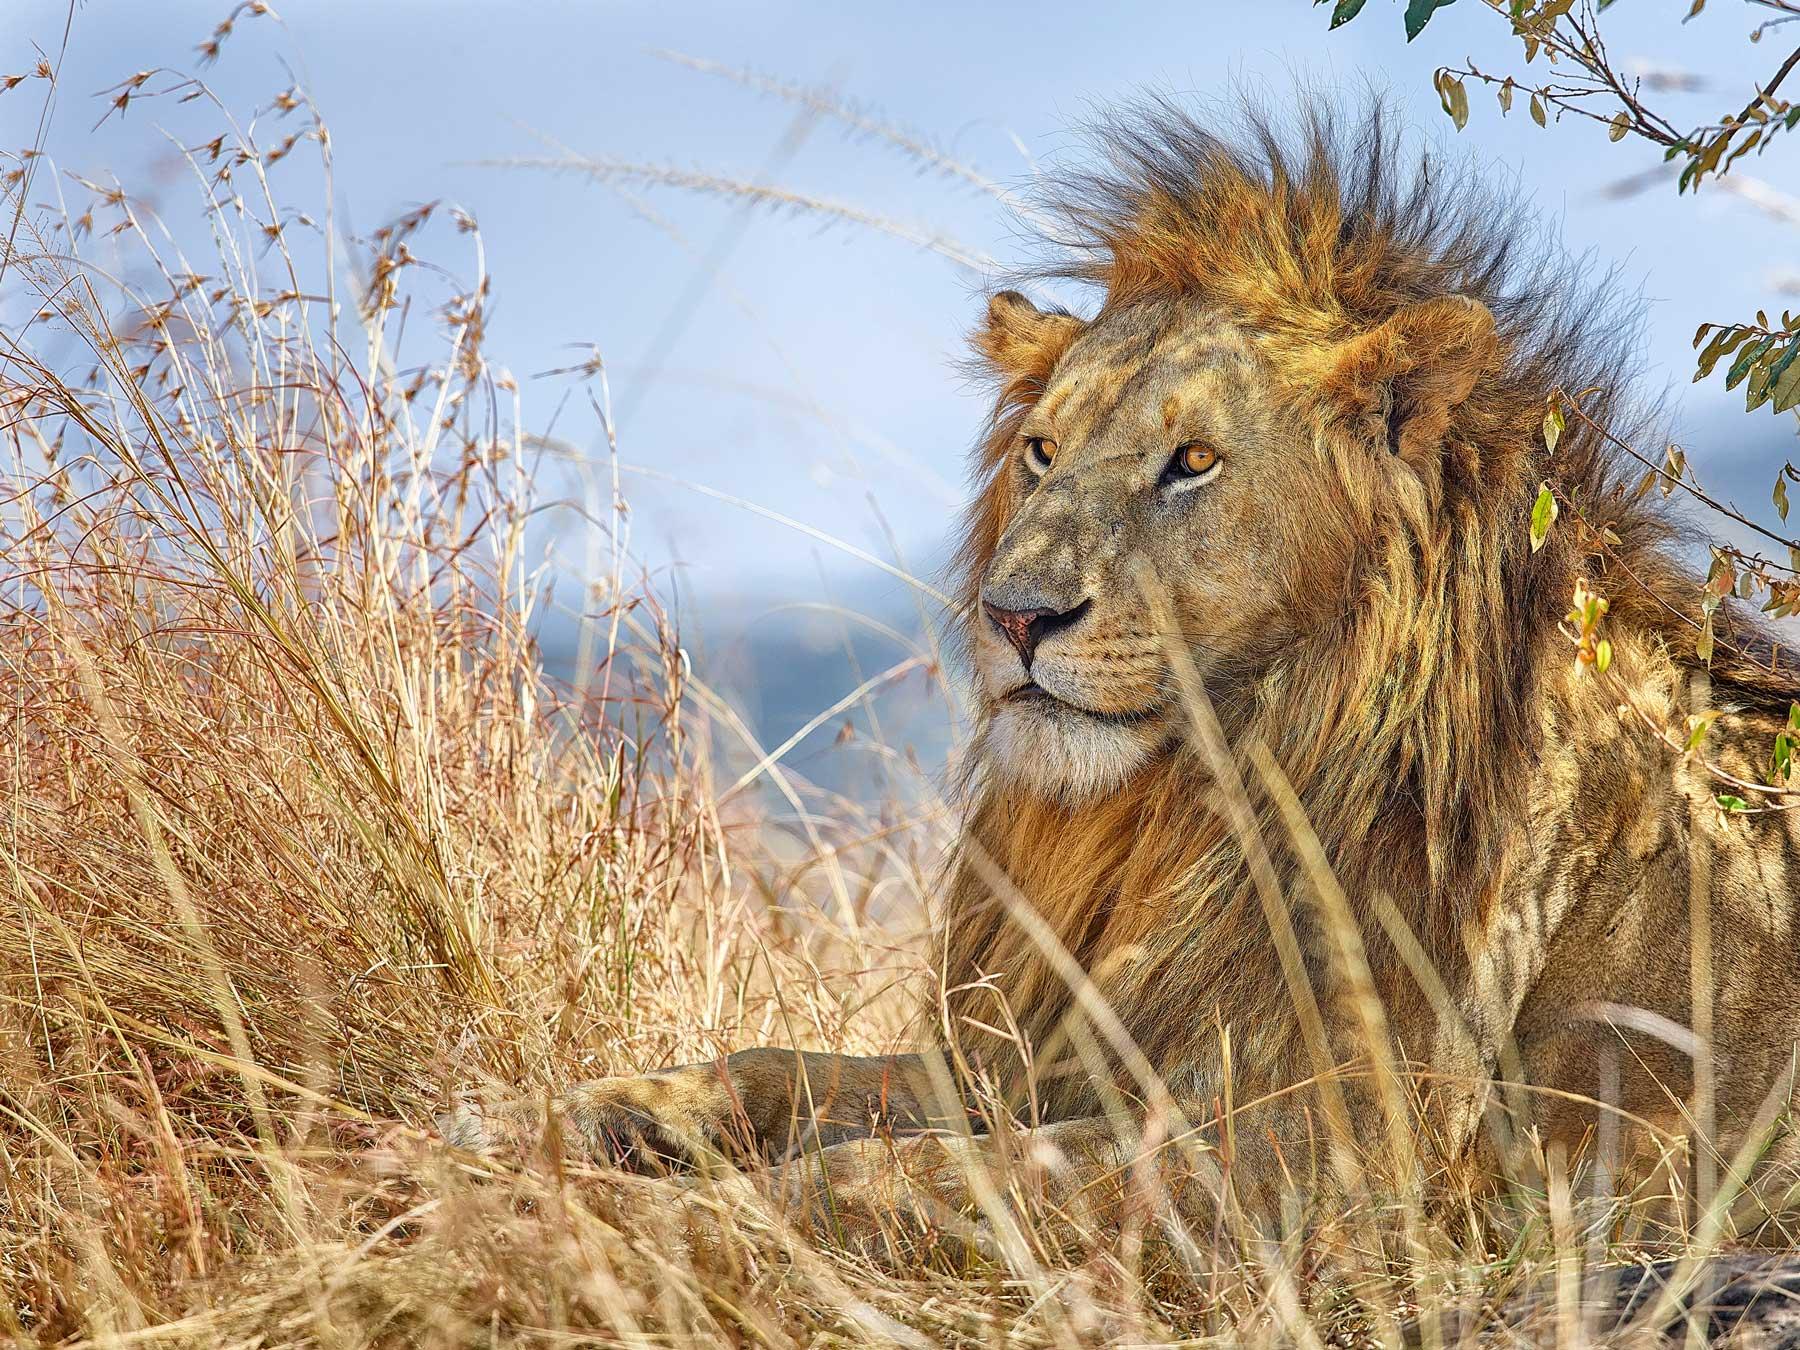 Lion, Kenya, Africa.